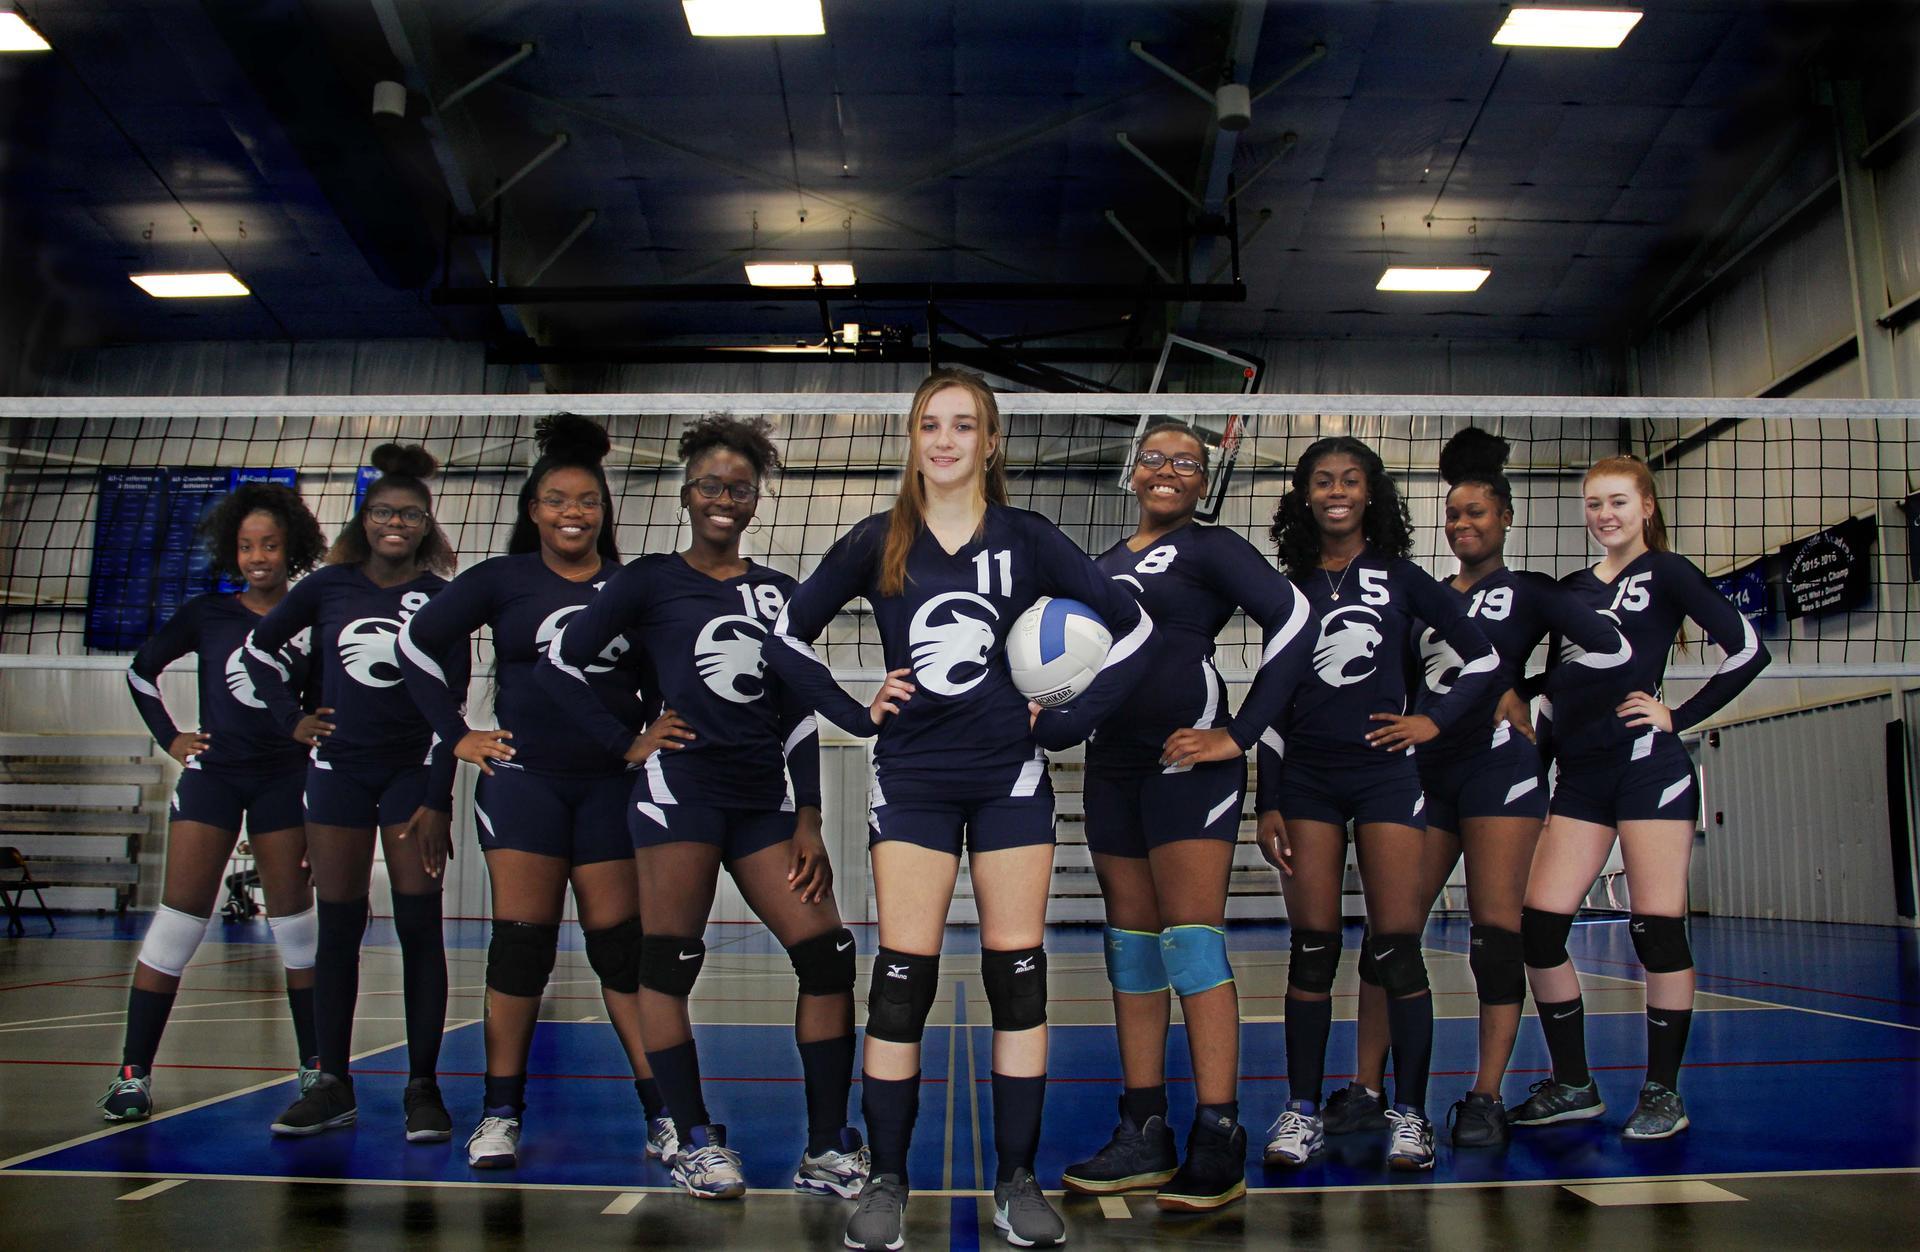 2018 Varsity Volleyball Team